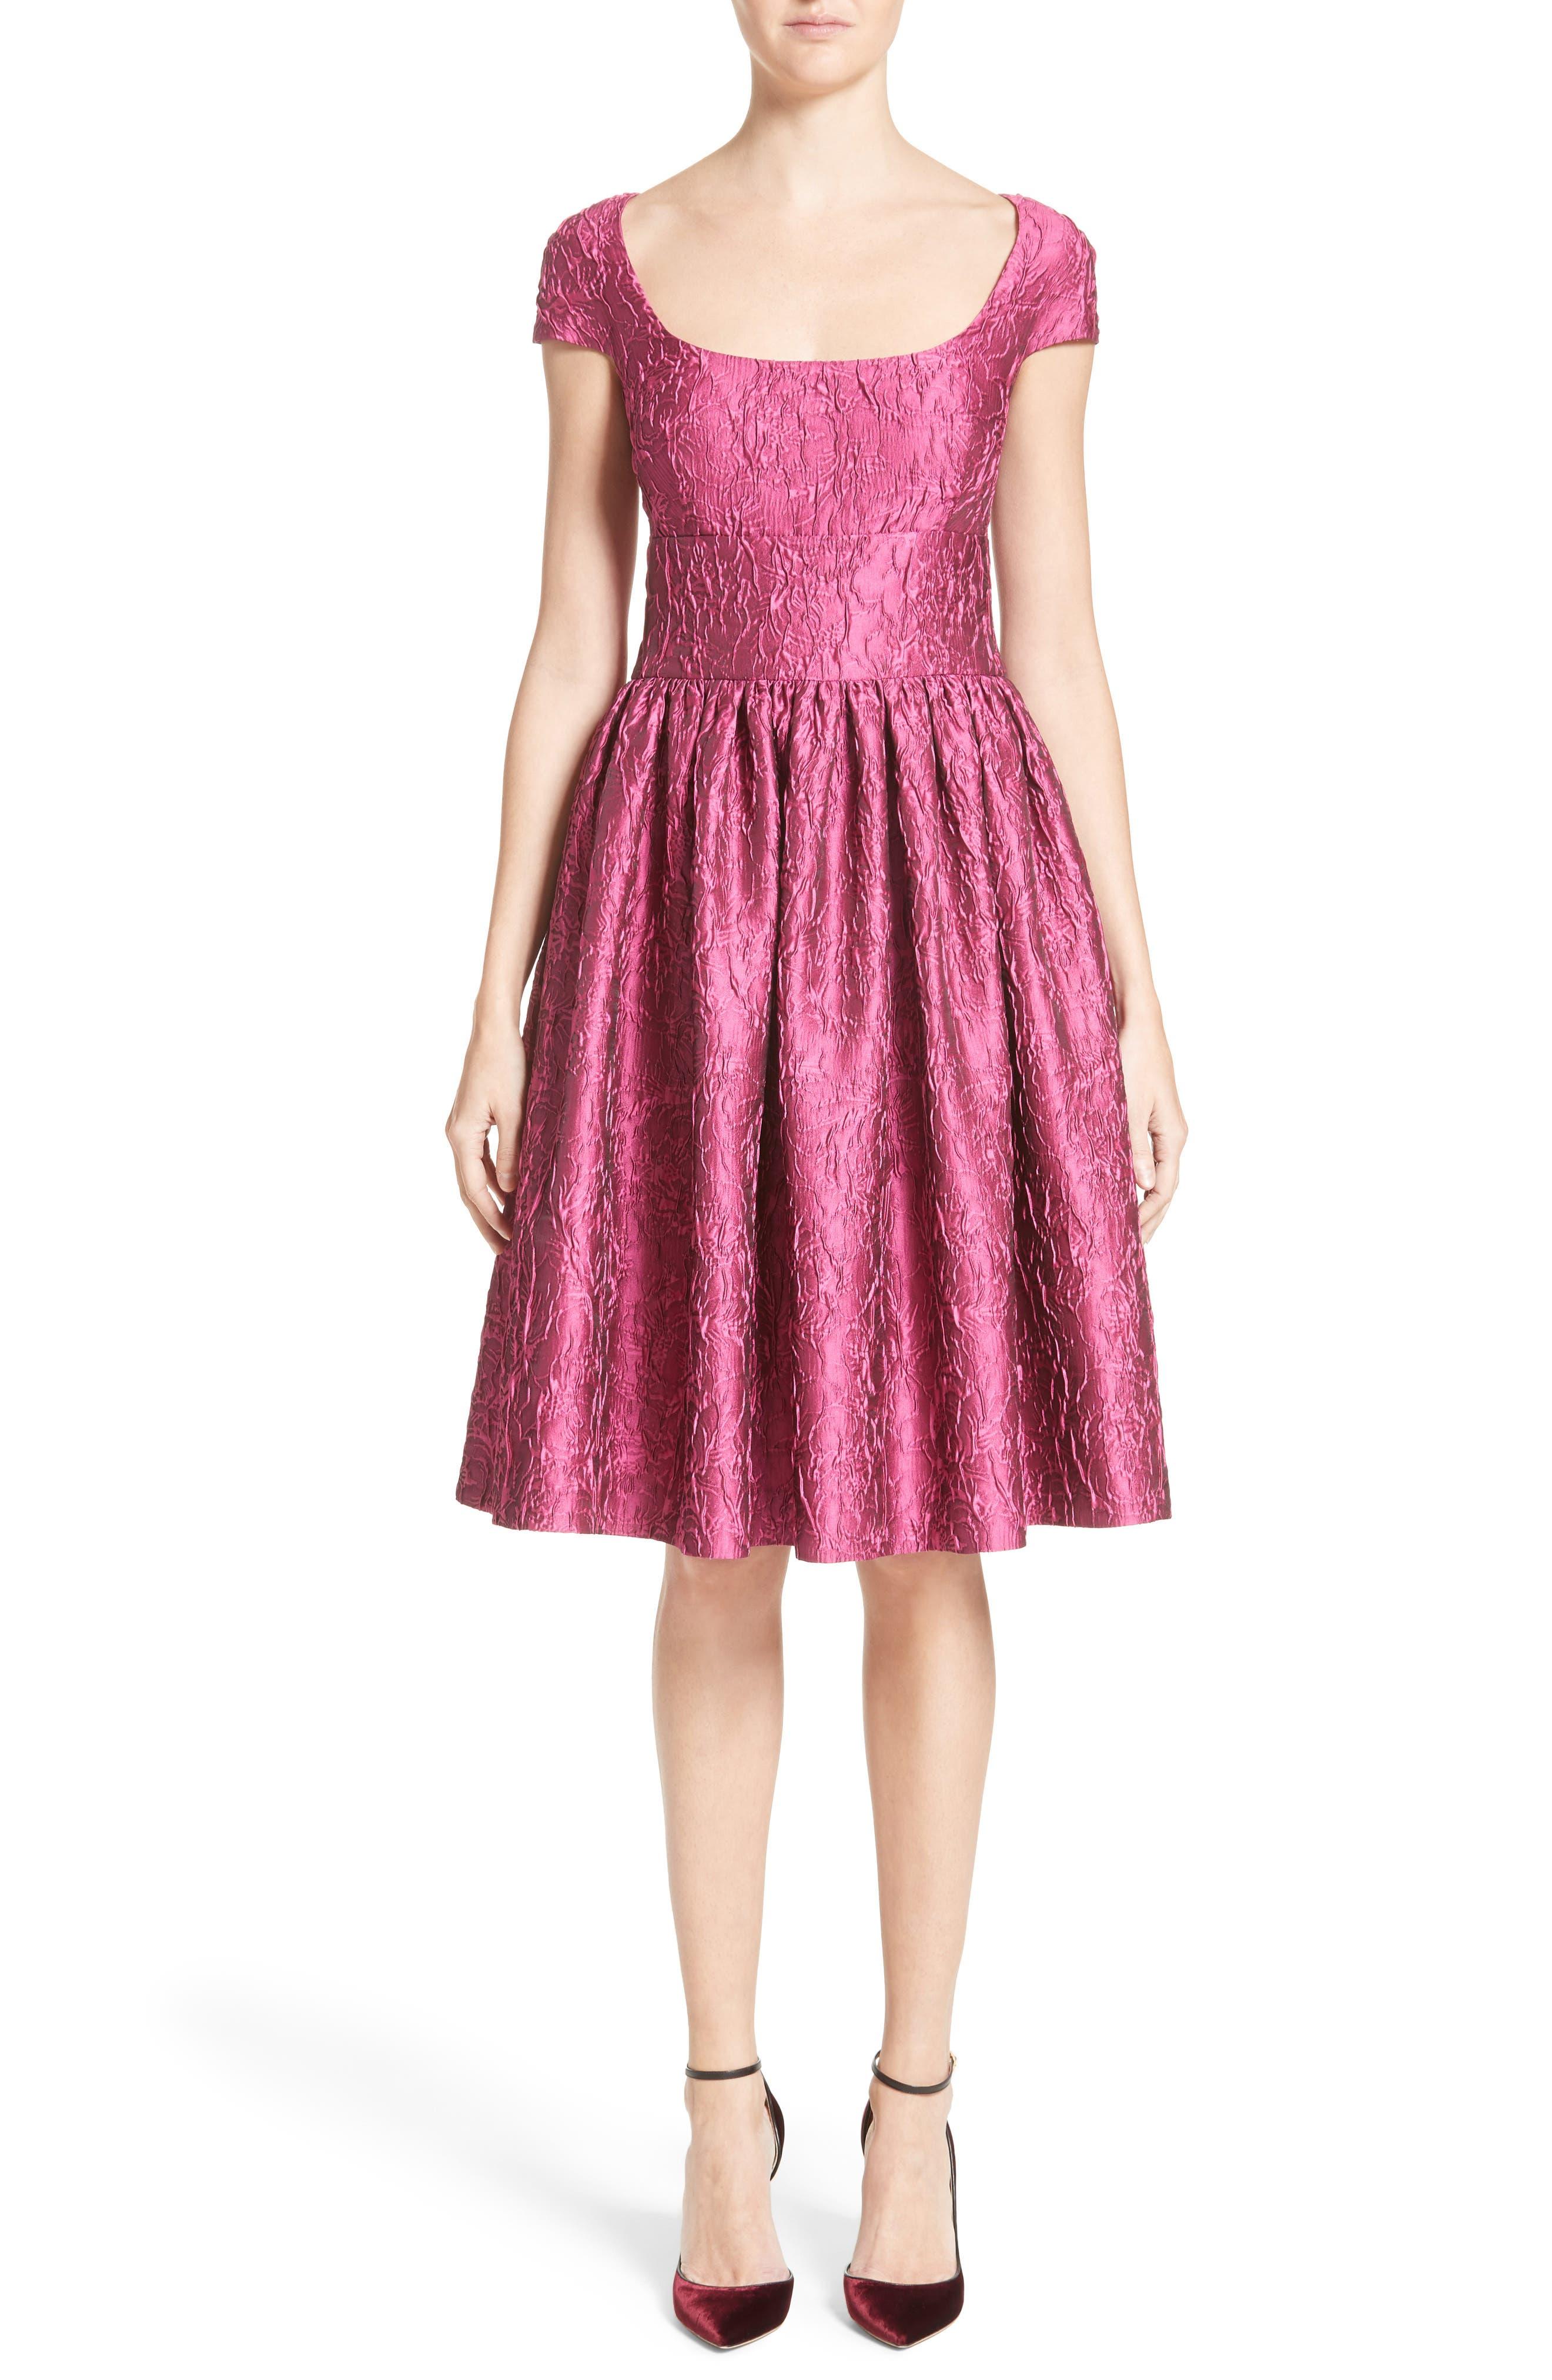 BADGLEY MISCHKA COUTURE. Badgley Mischka Couture Cap Sleeve Brocade Party Dress